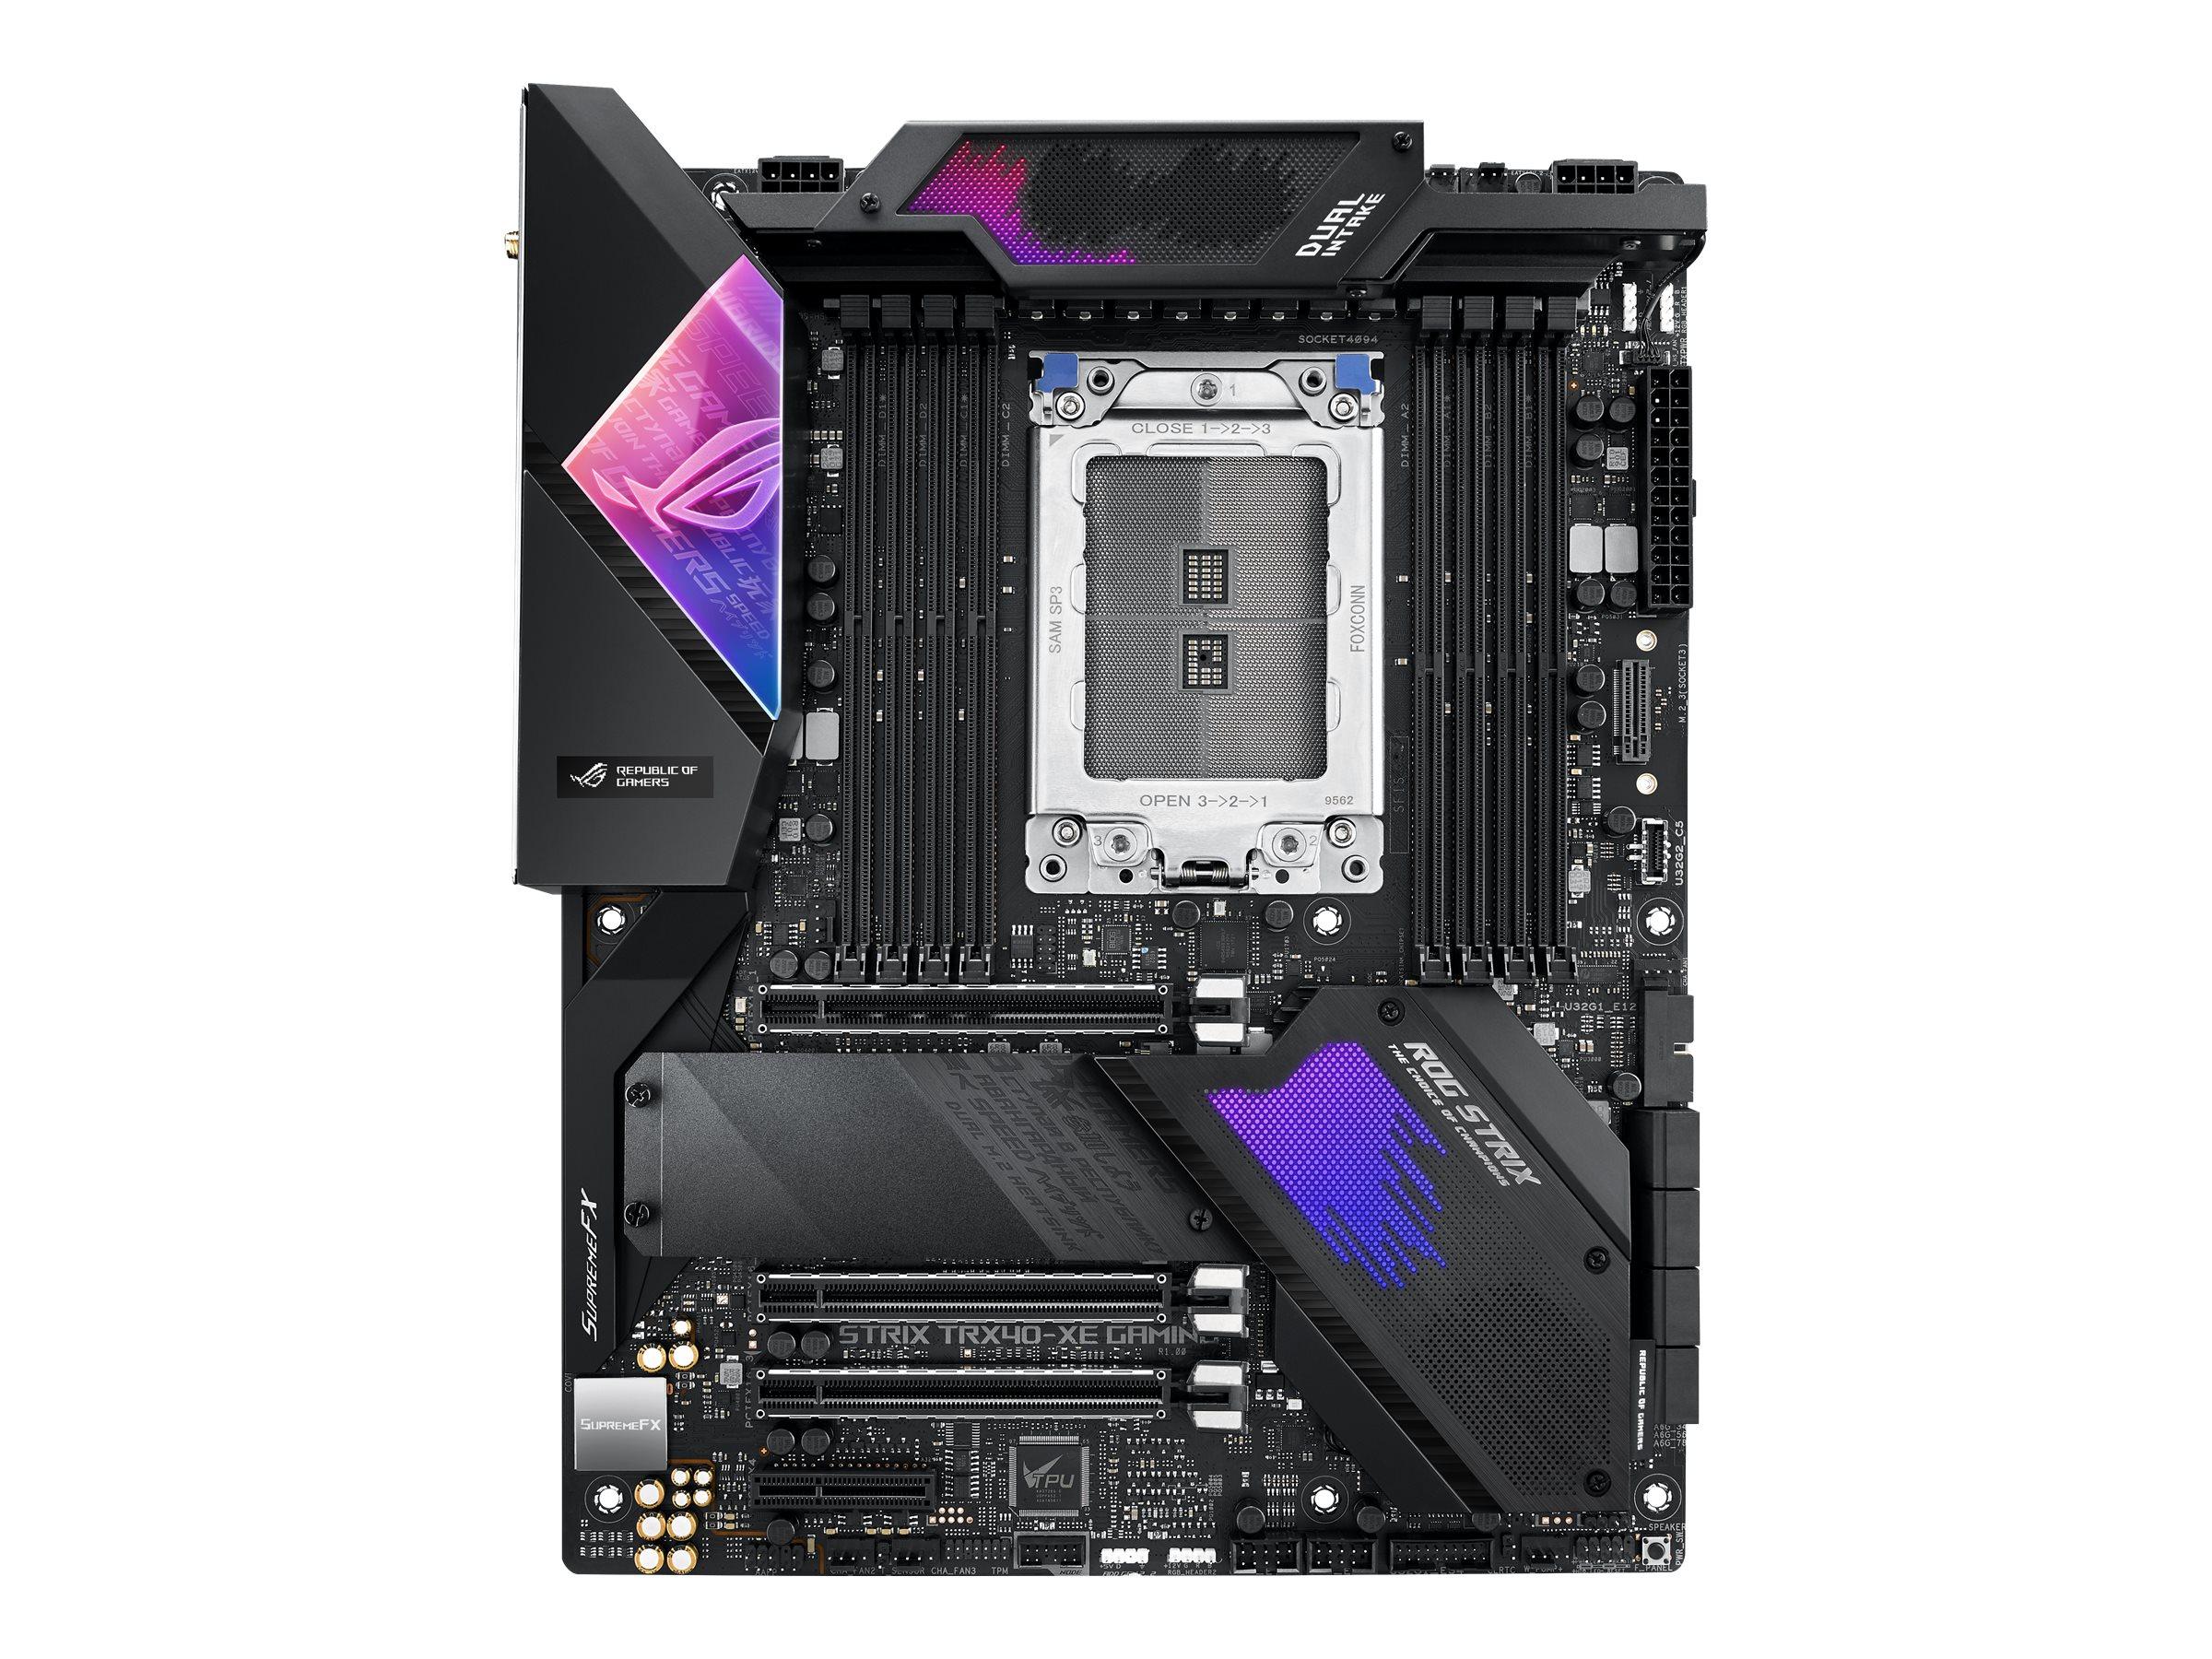 Vorschau: ASUS ROG STRIX TRX40-XE GAMING - Motherboard - ATX - Socket sTRX4 - AMD TRX40 - USB-C Gen2, USB 3.2 Gen 1, USB 3.2 Gen 2 - Gigabit LAN, 2.5 Gigabit LAN, Wi-Fi, Bluetooth - HD Audio (8-Kanal)